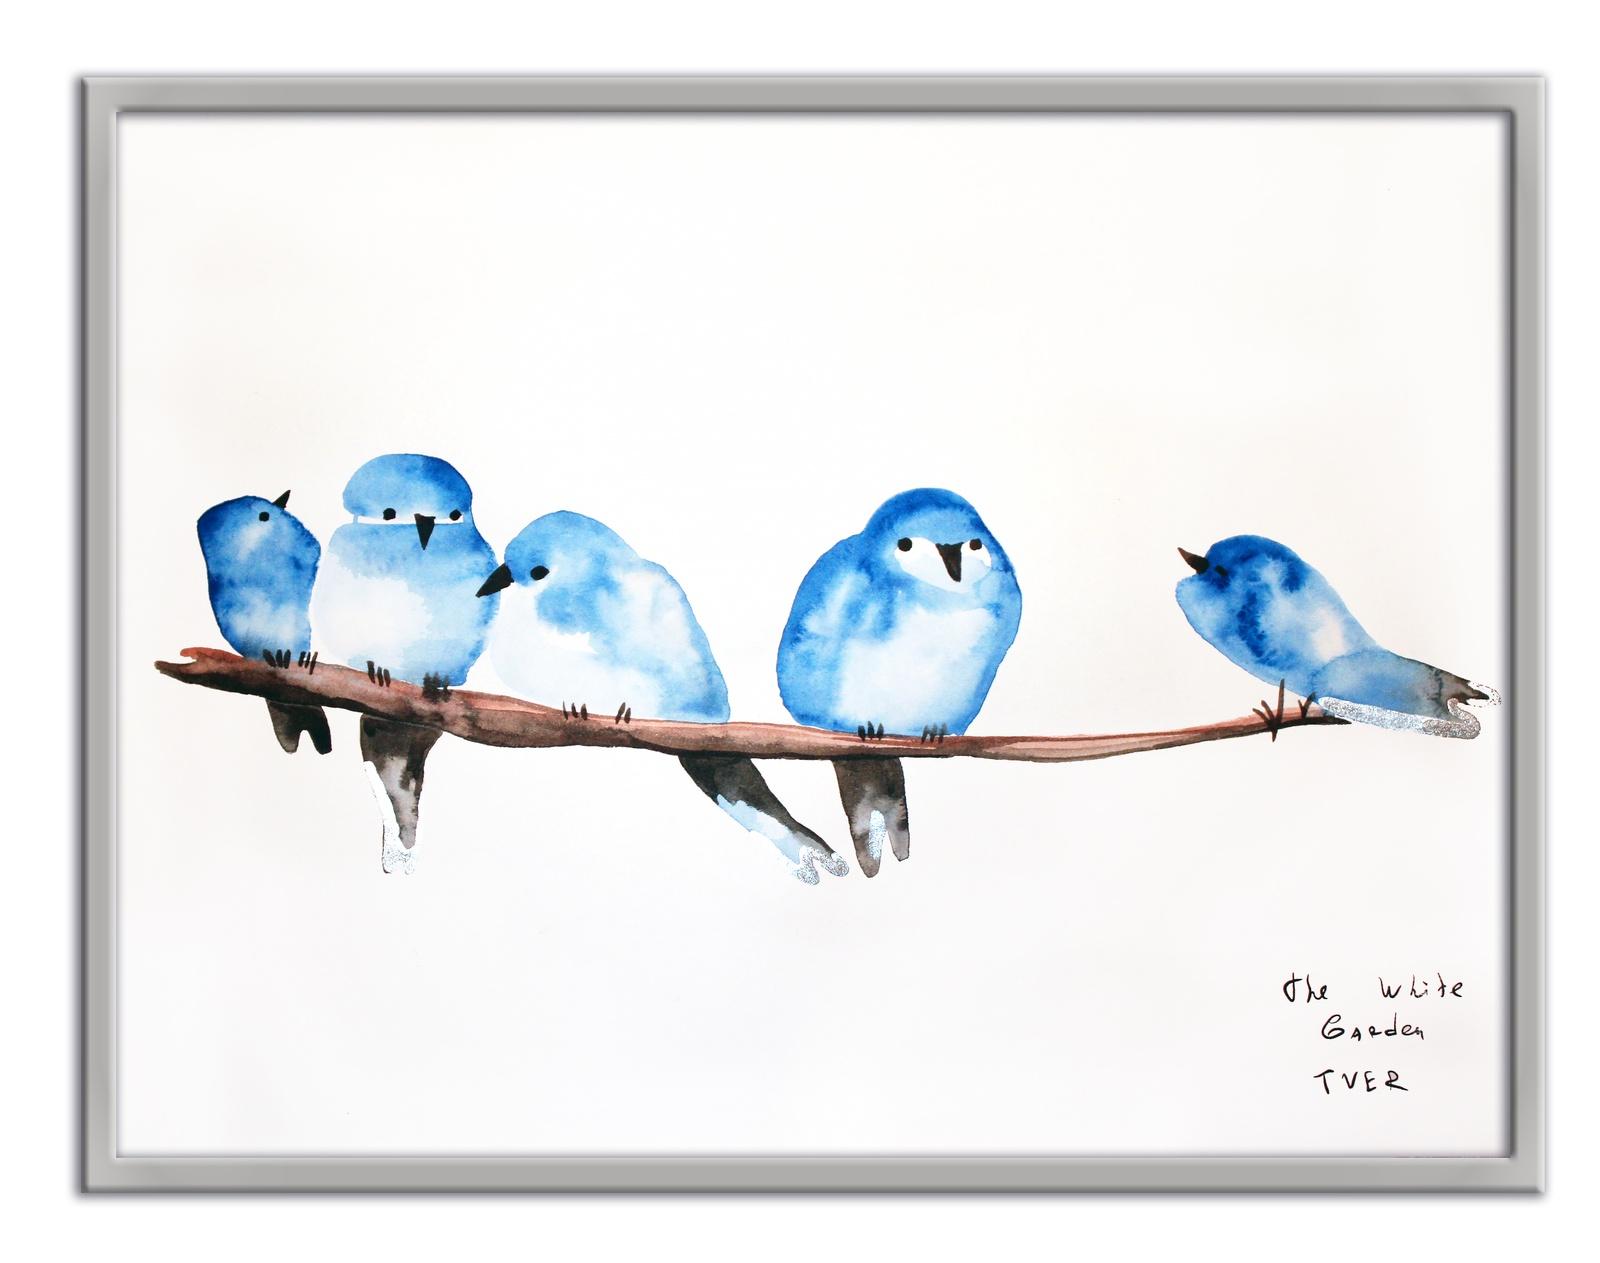 Картина The White Garden TVER Синицы, белый картина фото